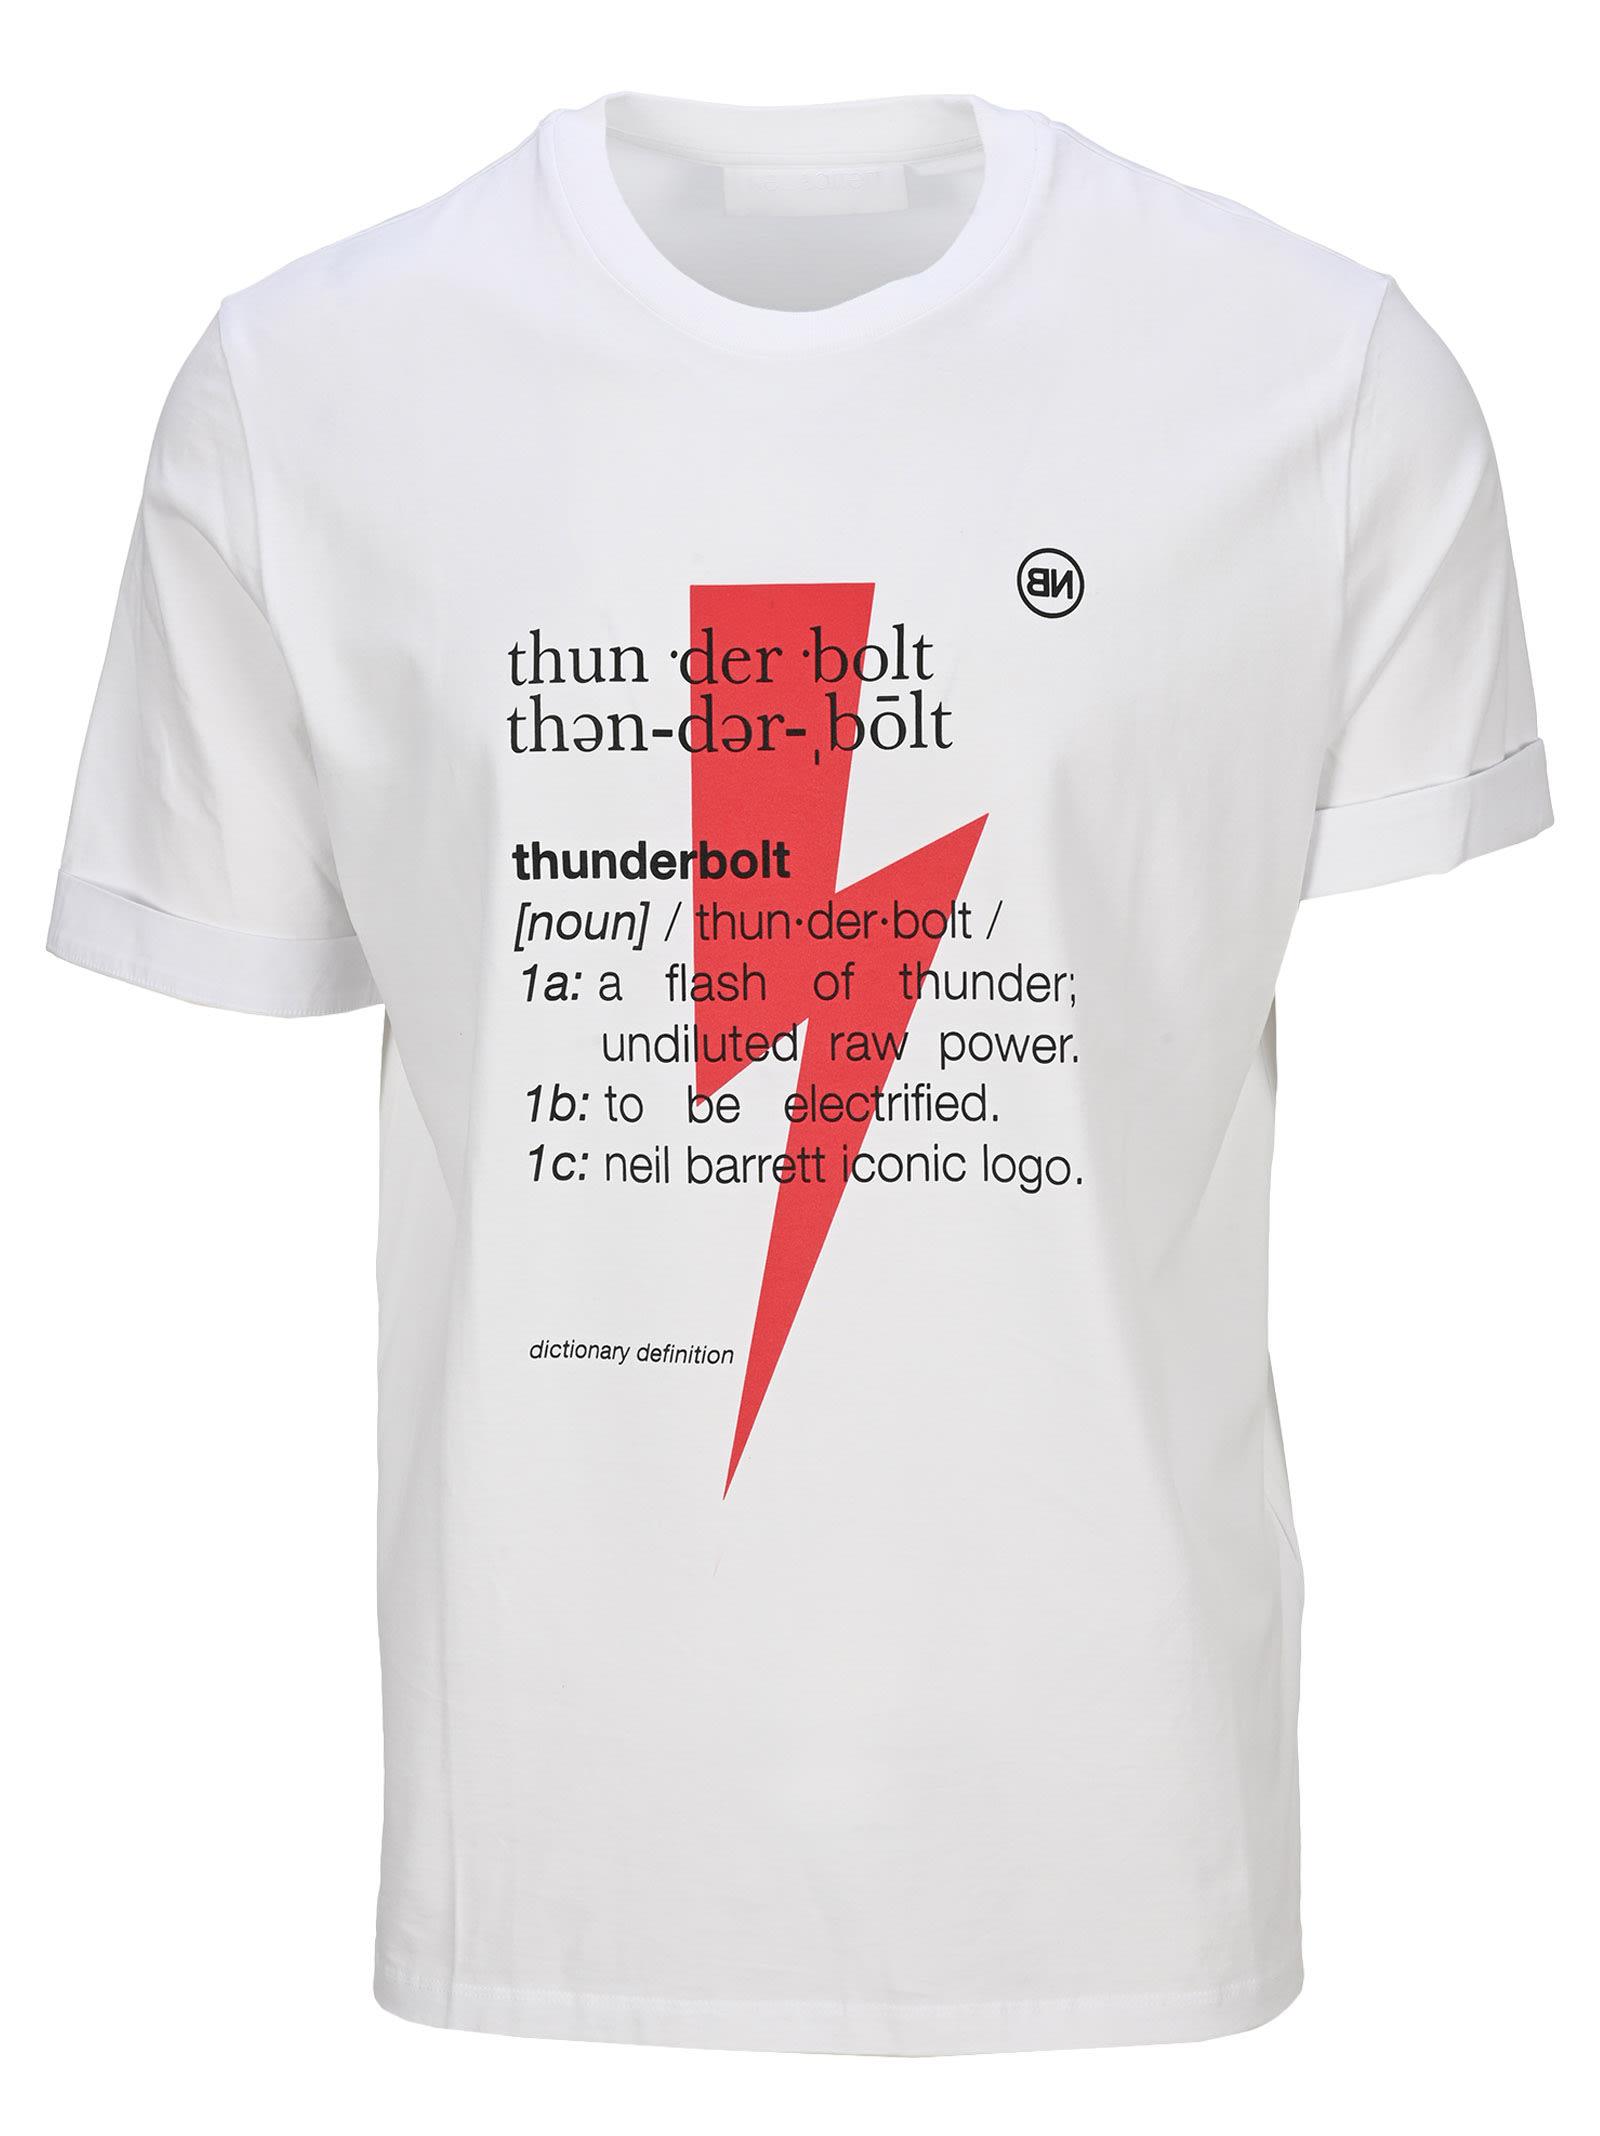 Neil Barrett Thunderbolt Definition T-shirt